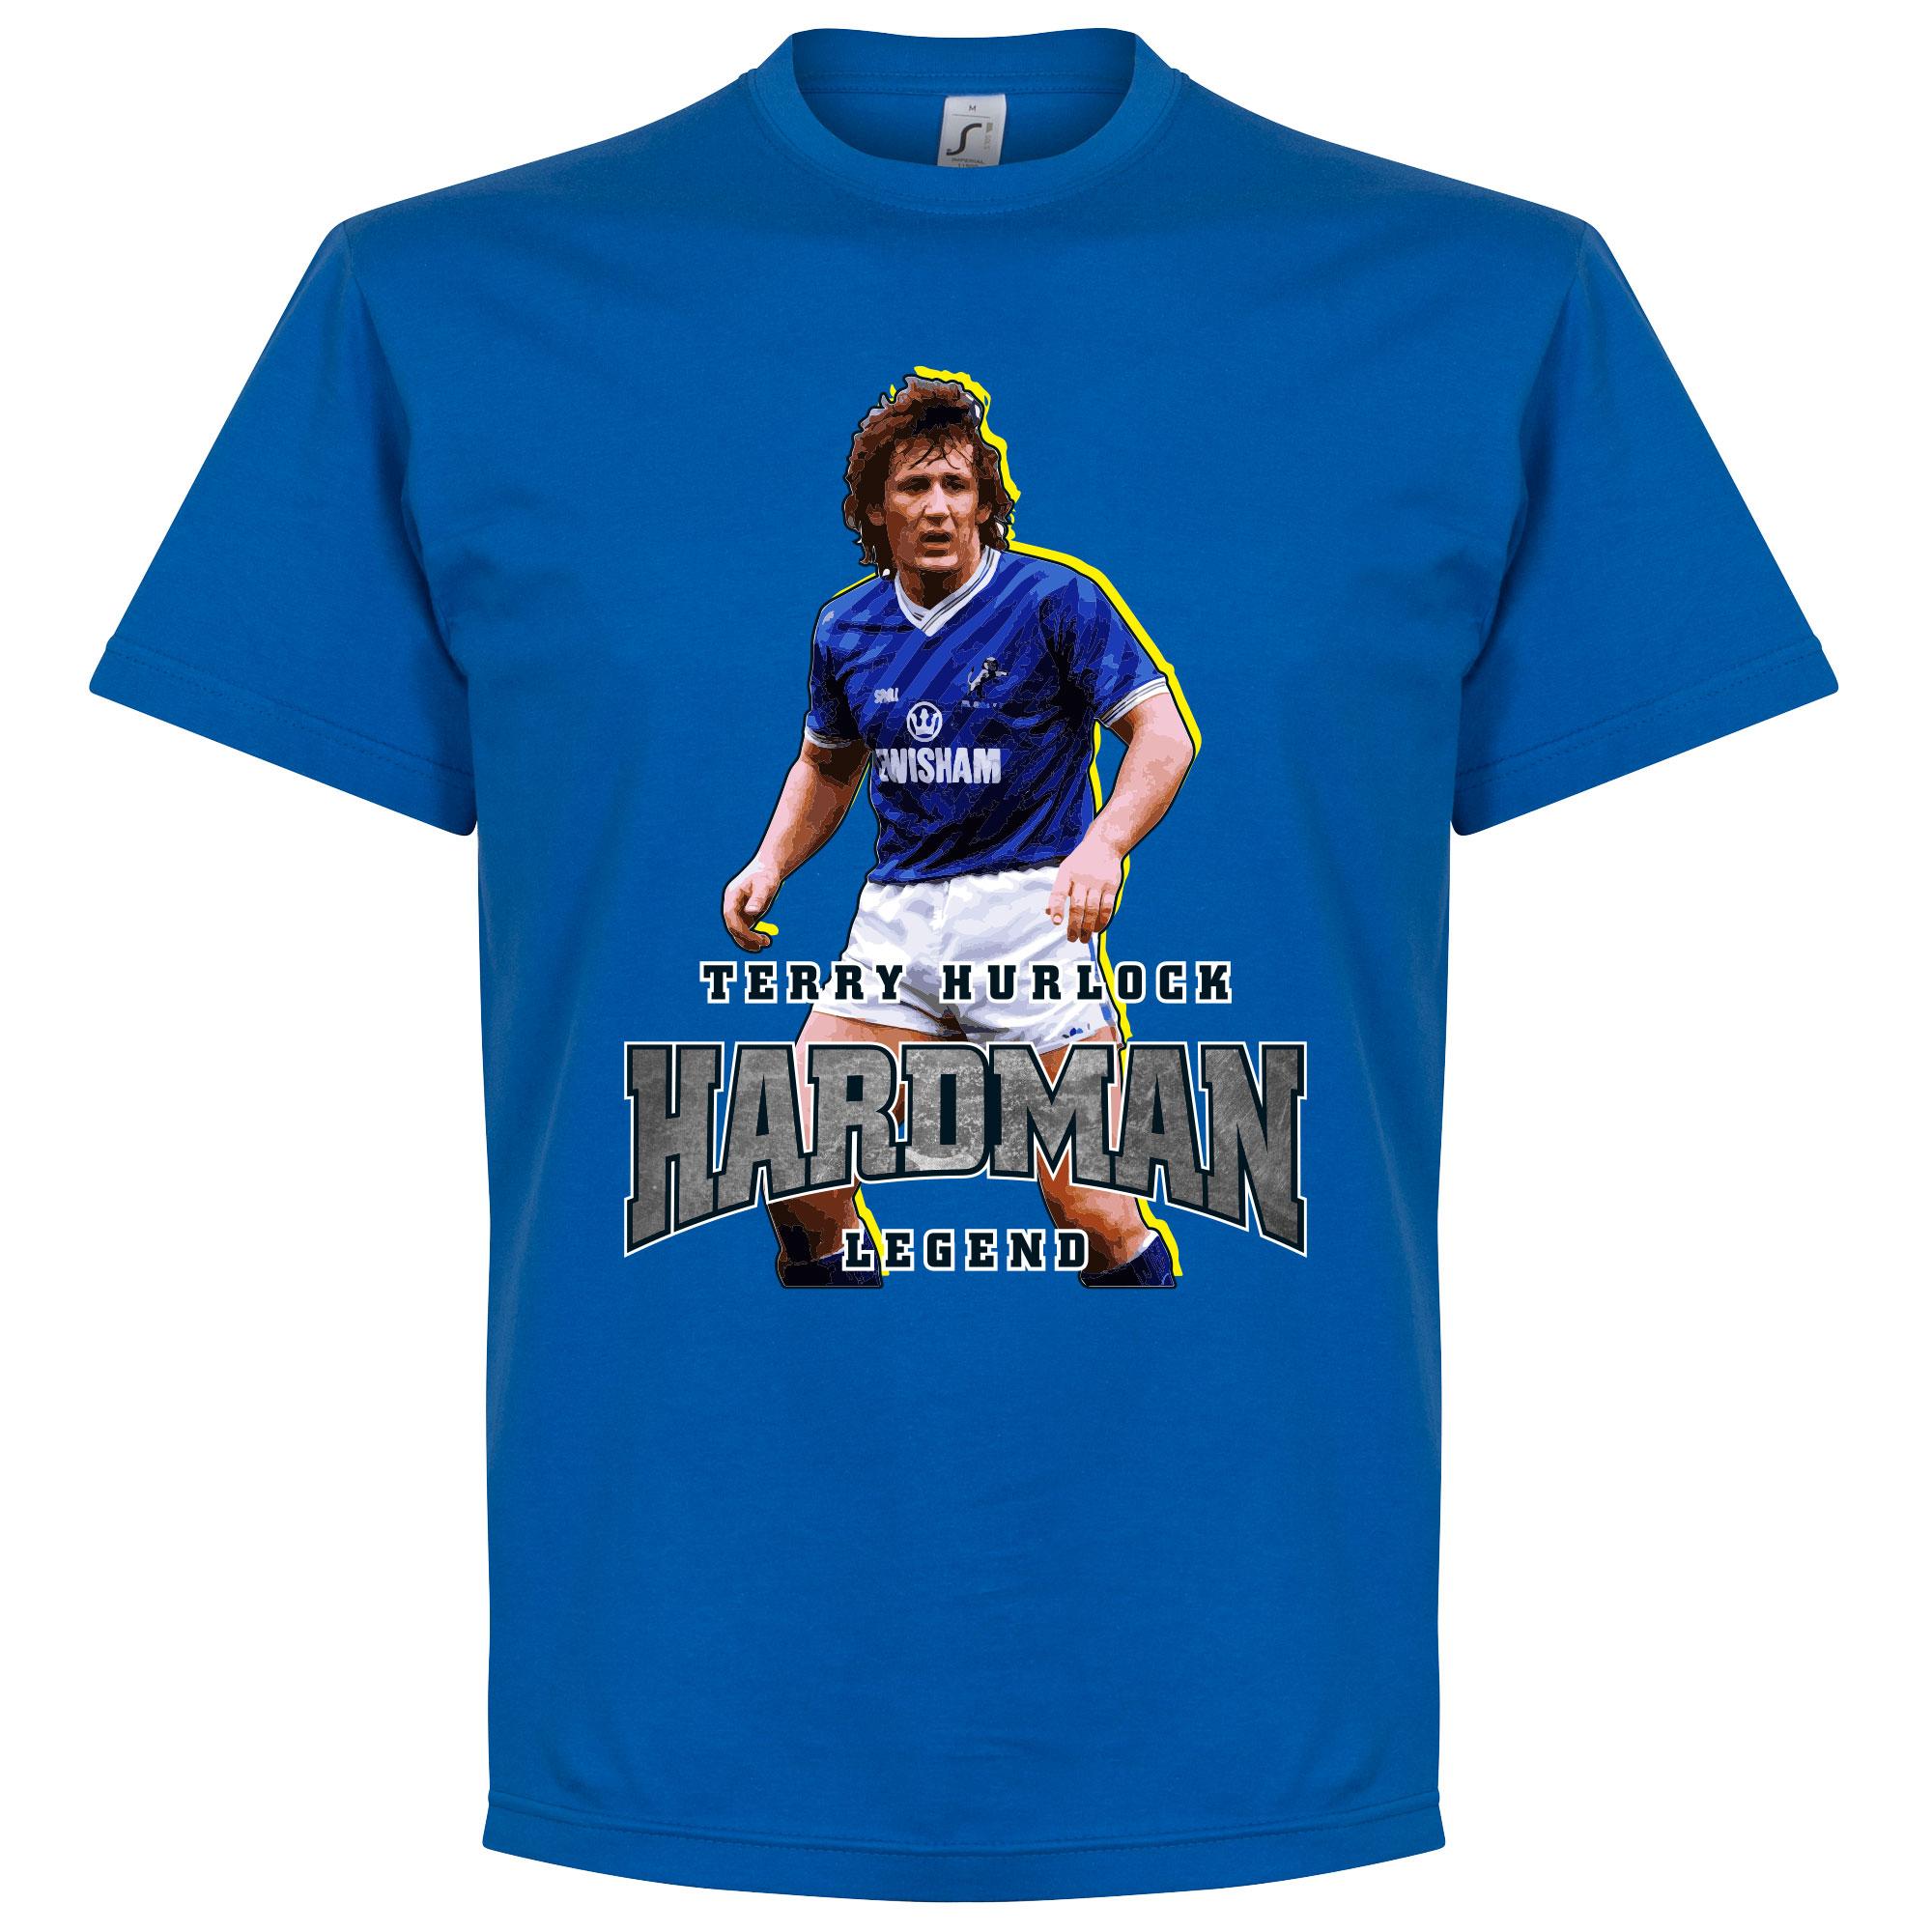 Terry Hurlock Hardman T-Shirt - Blauw